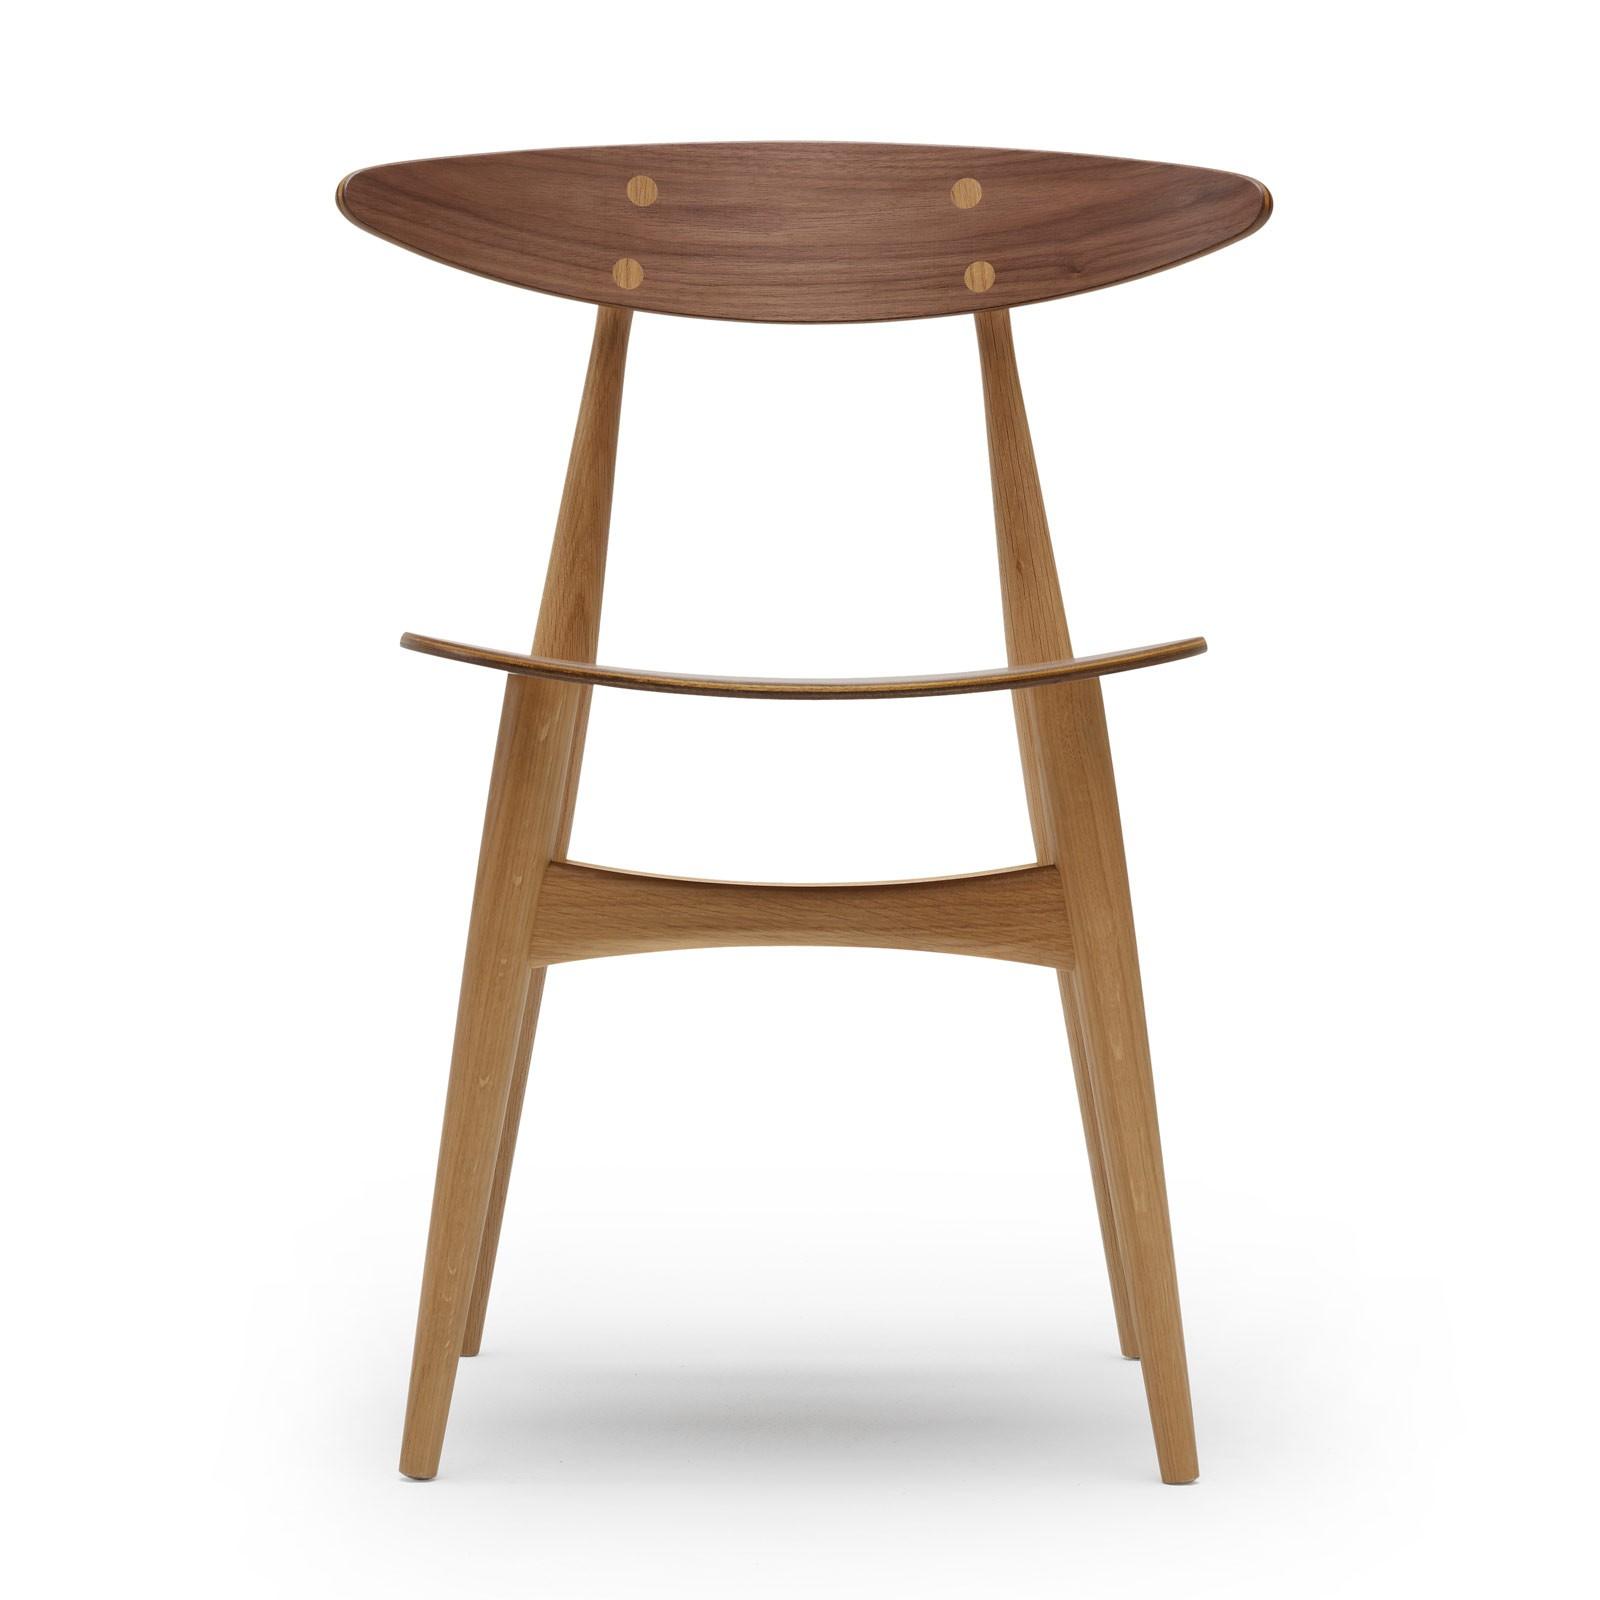 CH33 Chair Hans J Wegner Design By Carl Hansen